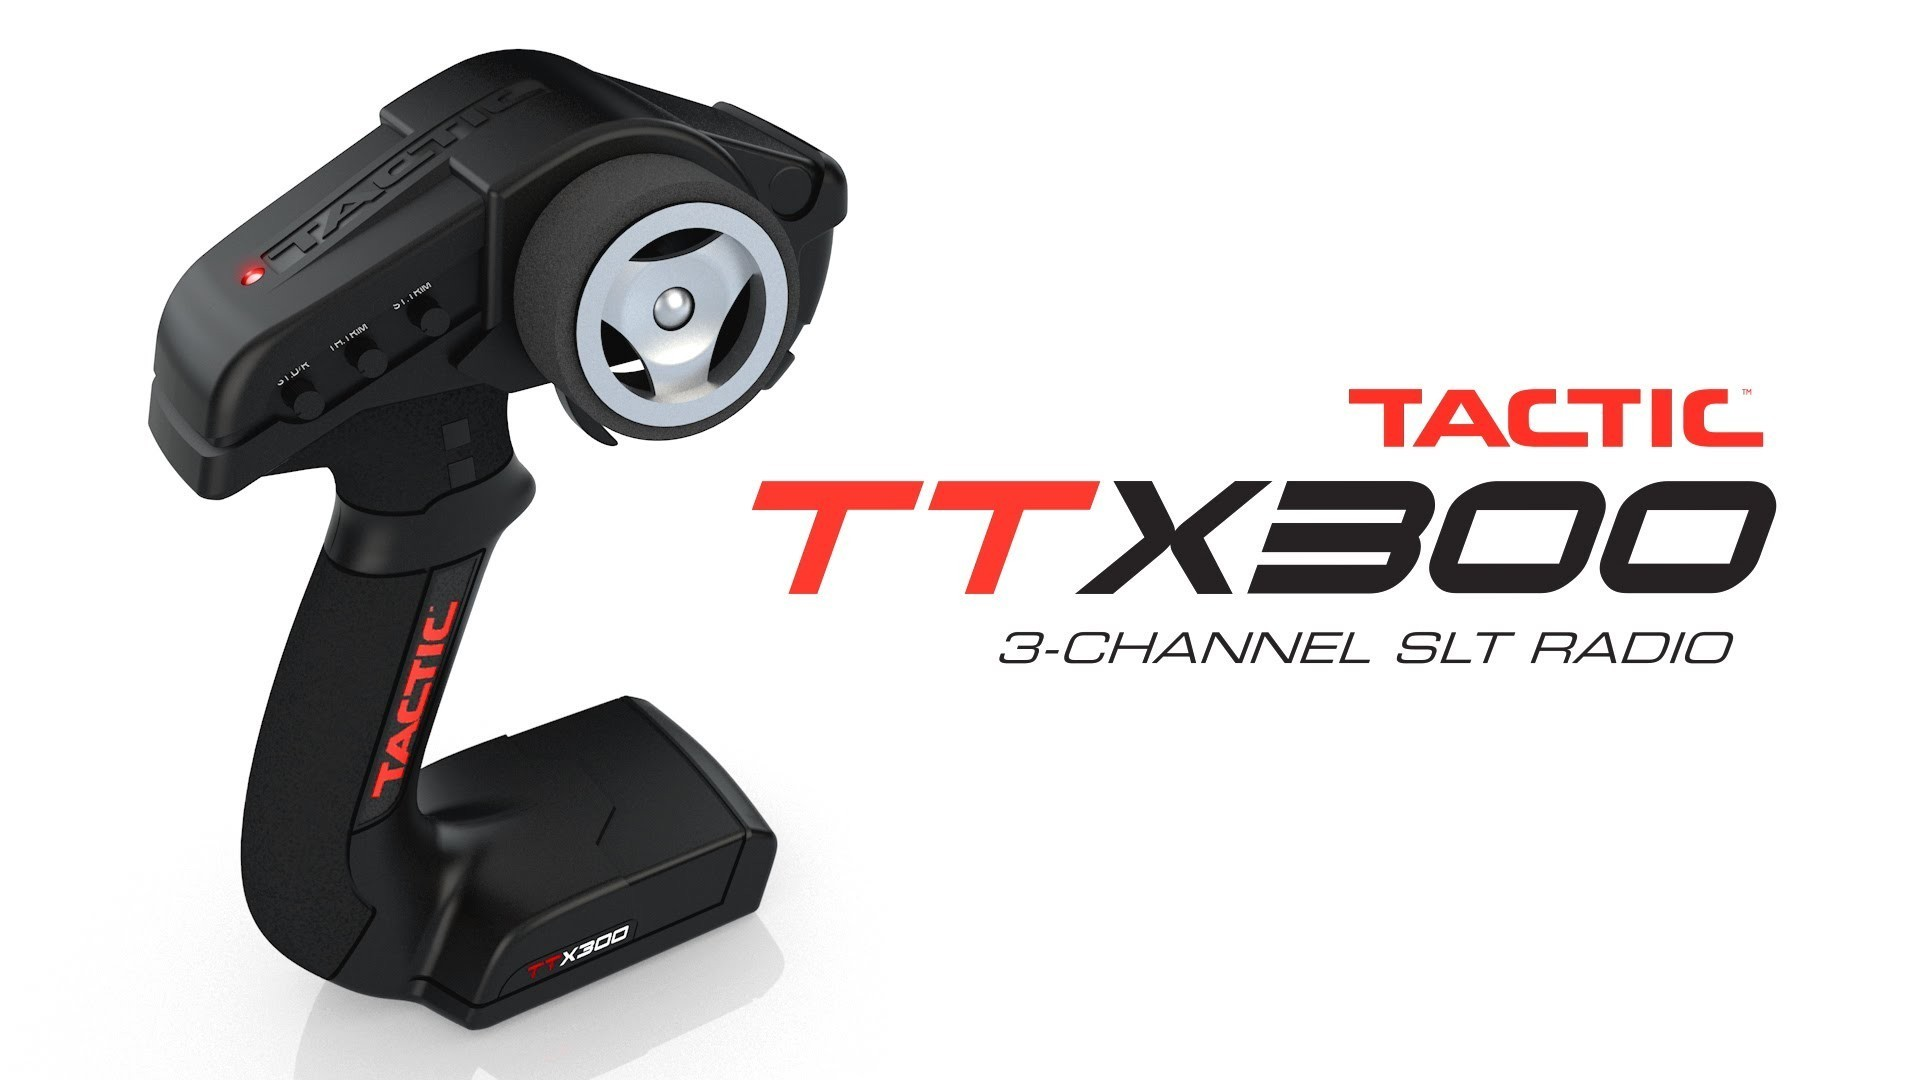 Rádio RC de Controlo Remoto TTX300